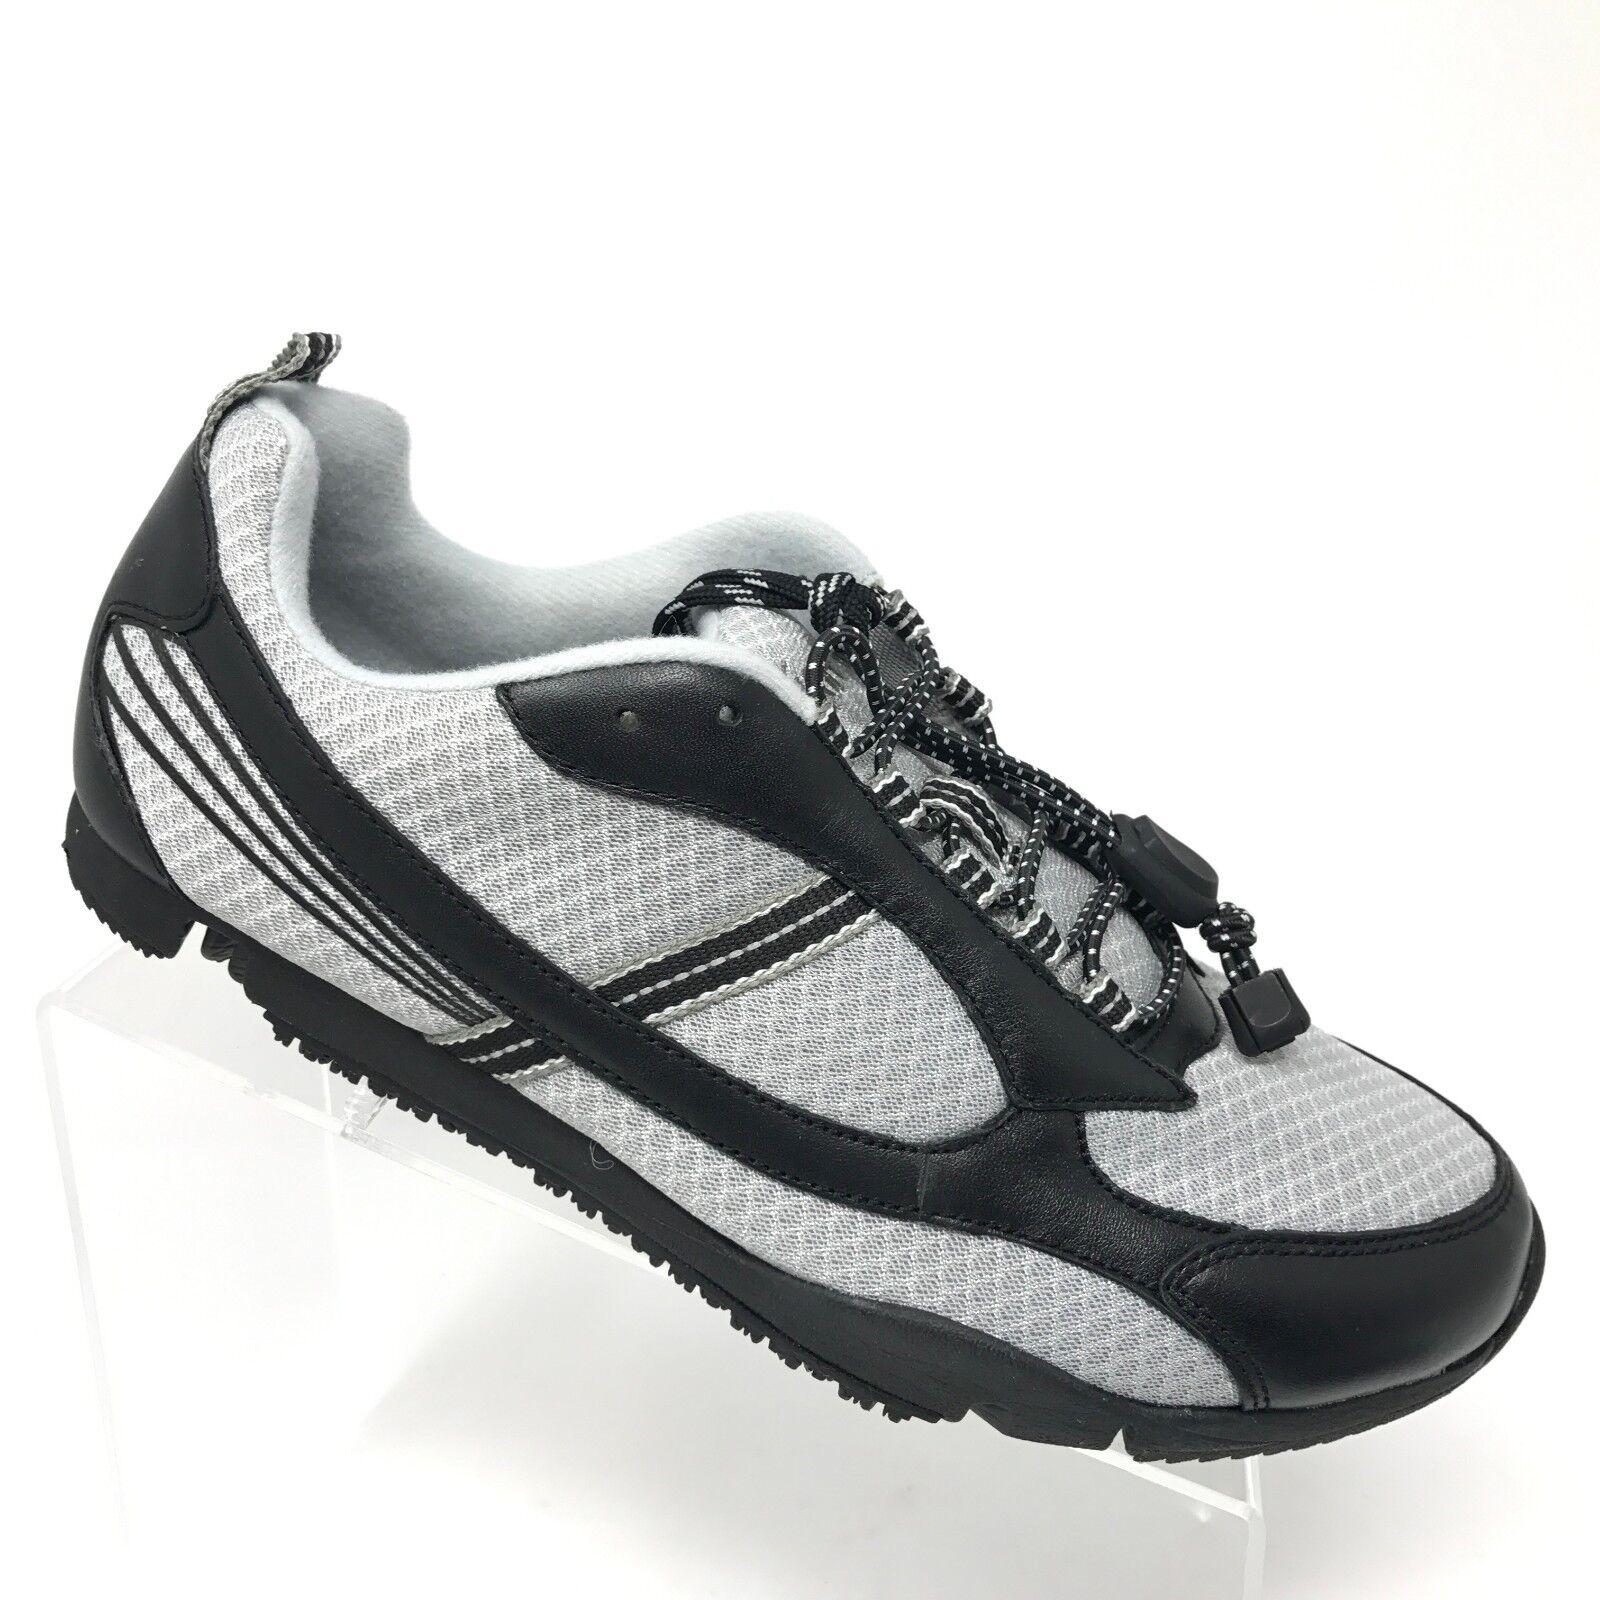 Dr Comfort GARY Orthopedic Sneaker Black Gray Mesh Comfort Shoe Mens SIZE 9 XW